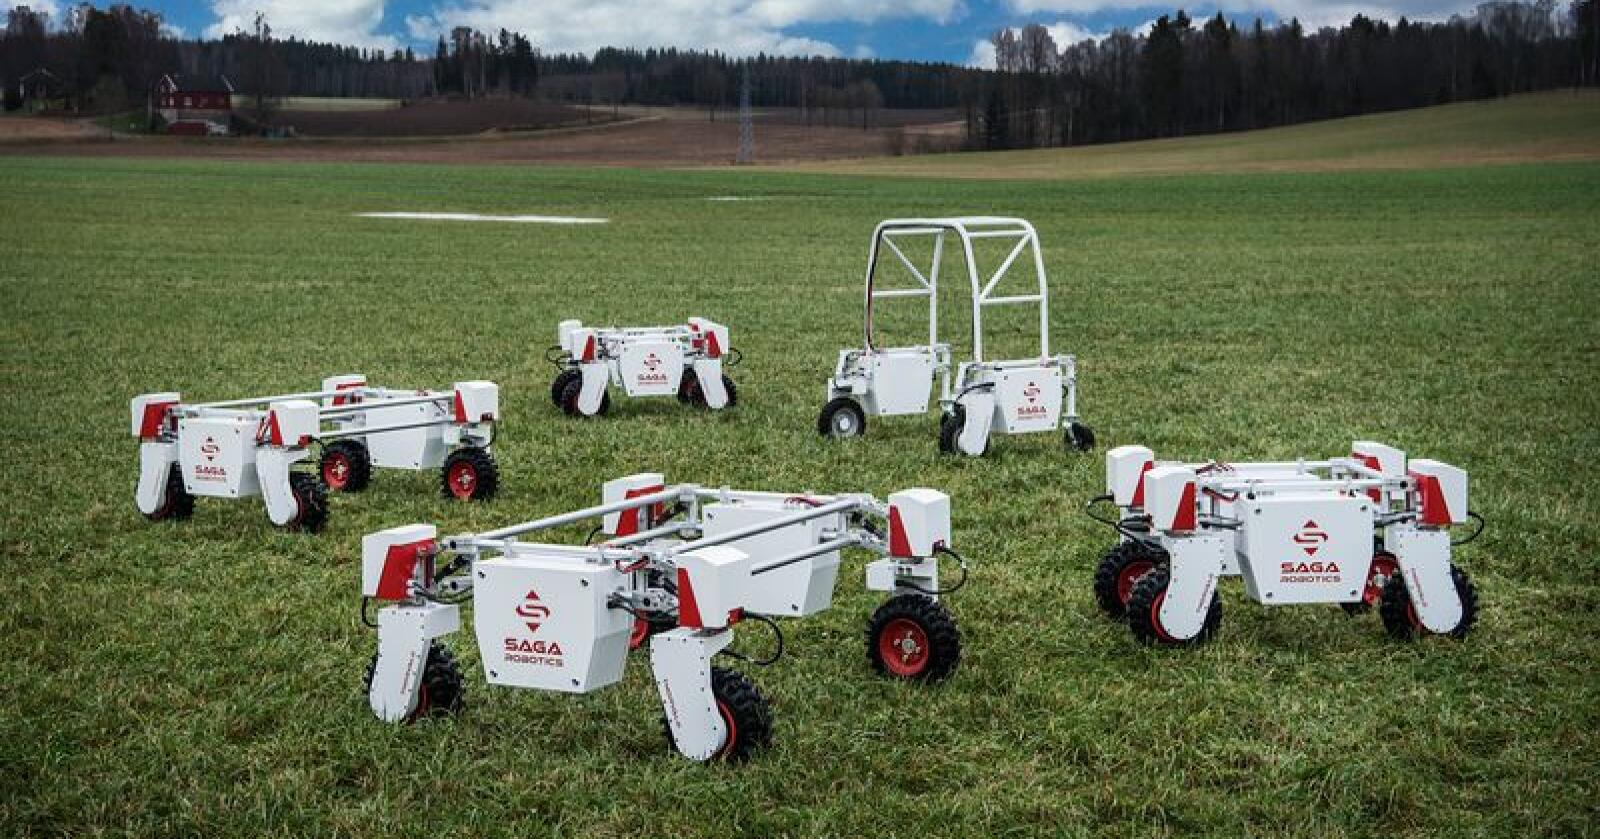 Saga Robotics vant i kategorien beste FoodTech/Agritech Startup. (Foto: Benjamin A. Ward, Saga Robotics)